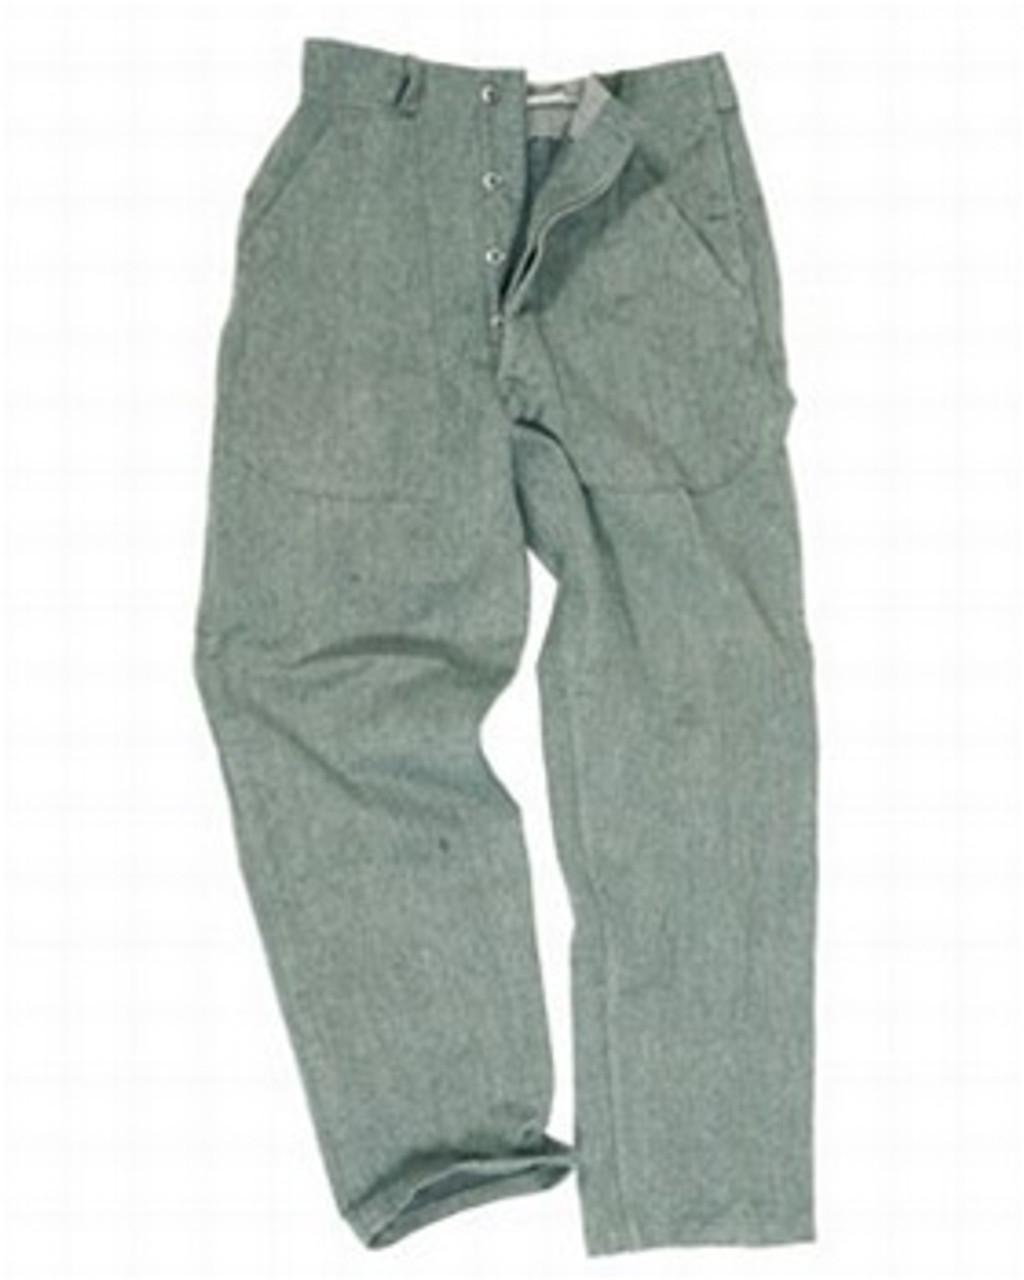 Swiss Grey Cotton Work Pants from Hessen Antique